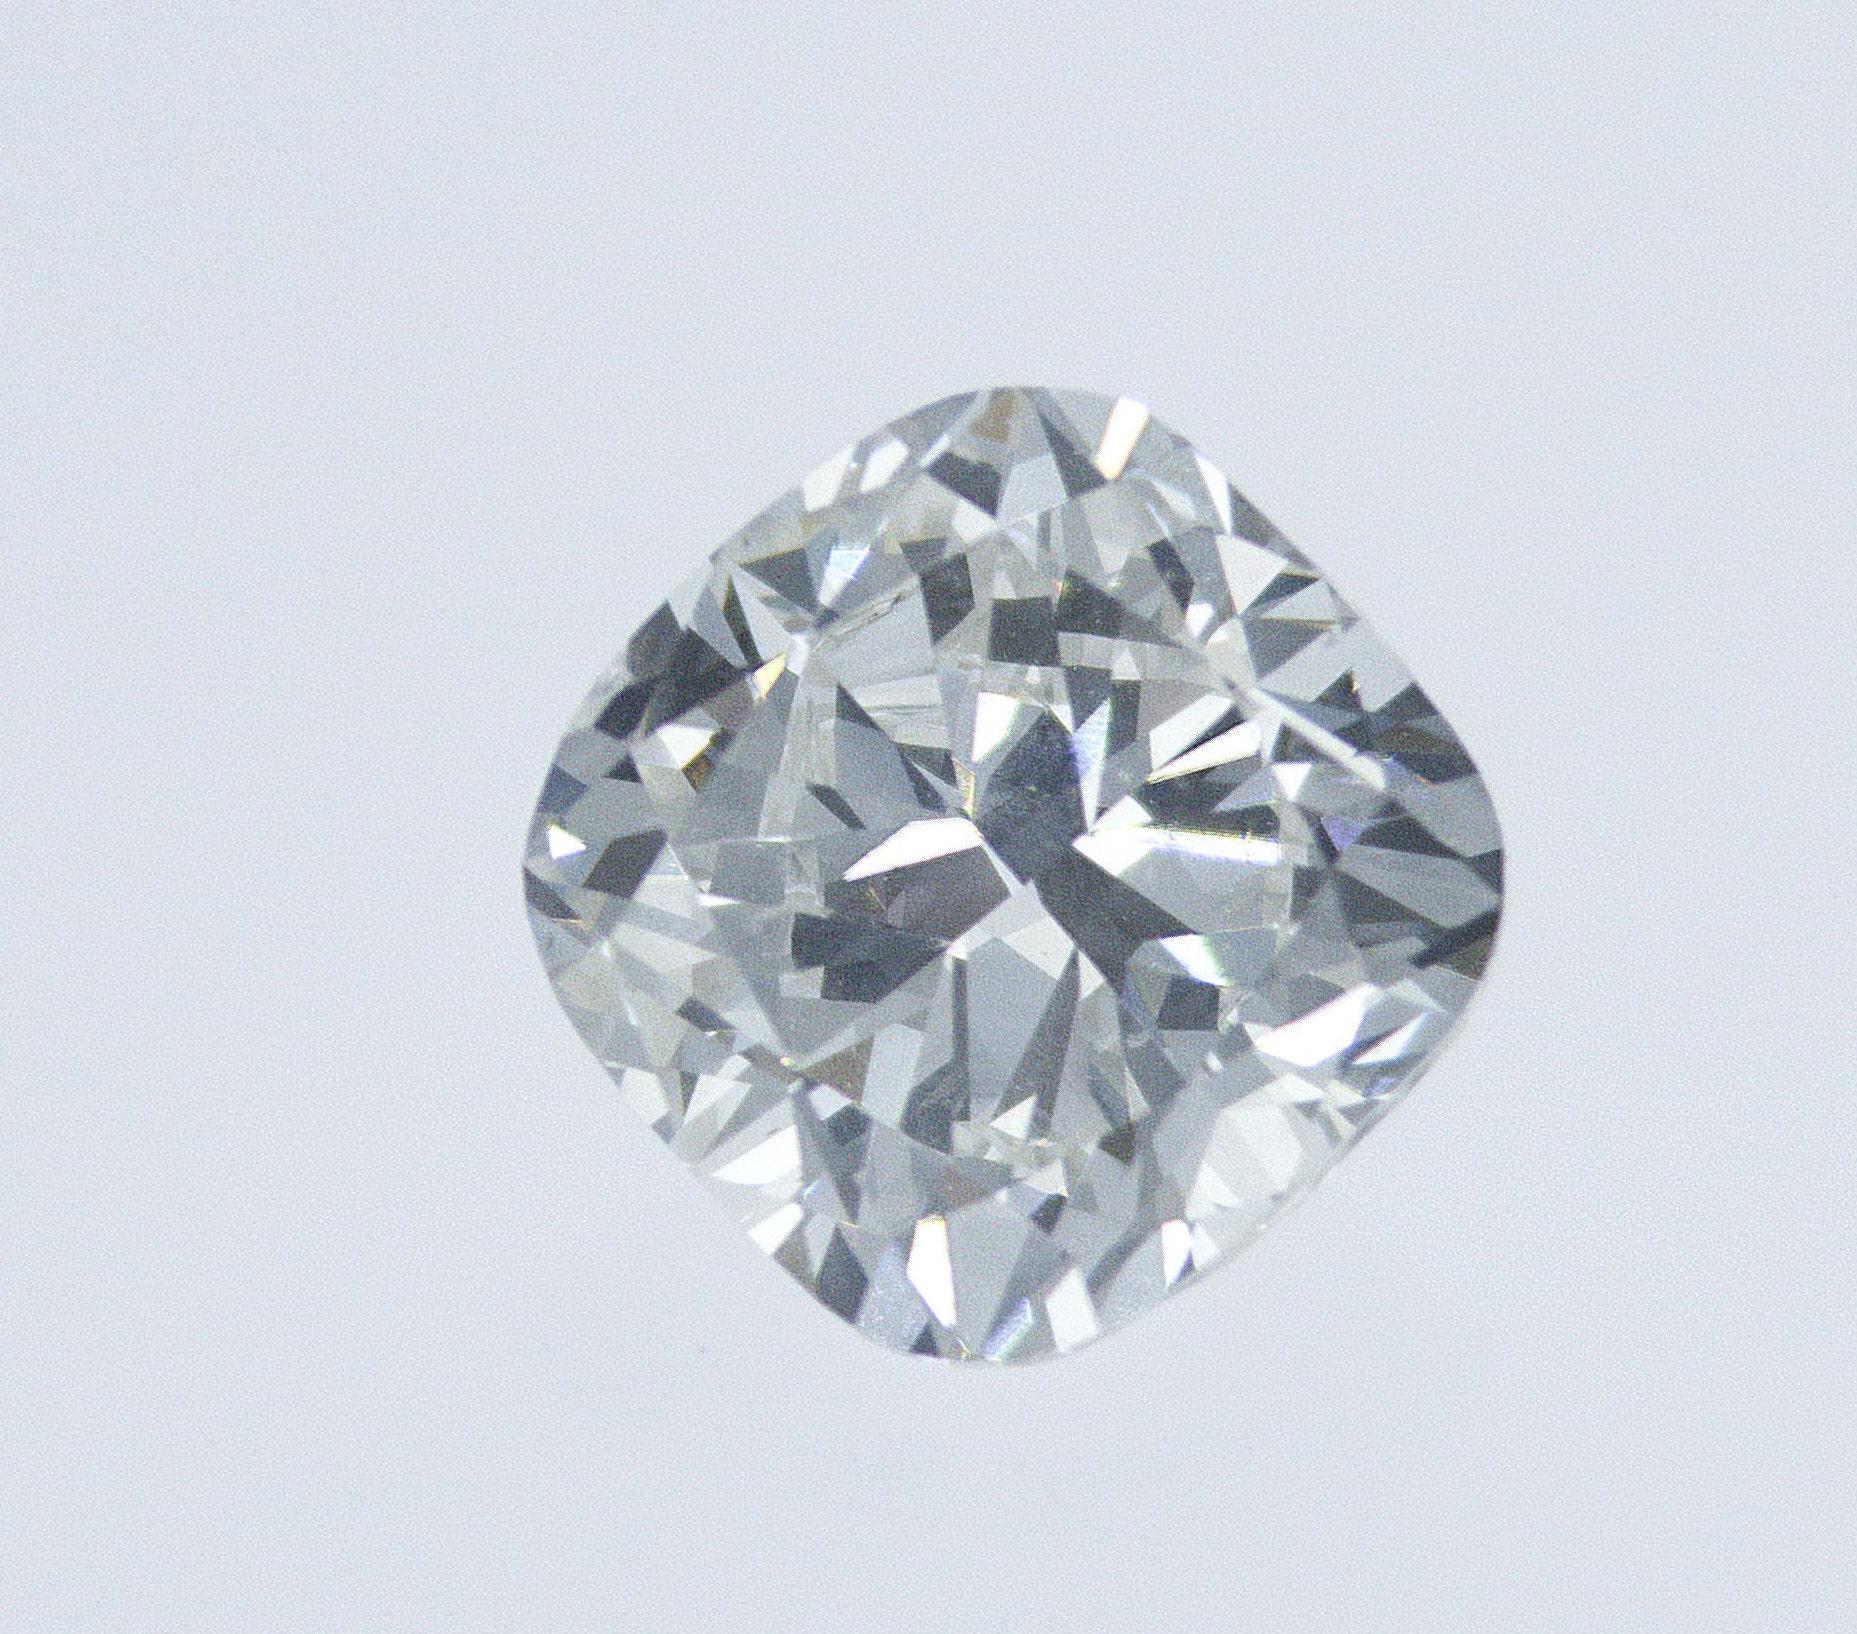 1 40ct Carat Gia Certified Cushion Cut Brilliant Loose Diamond J Color Si1